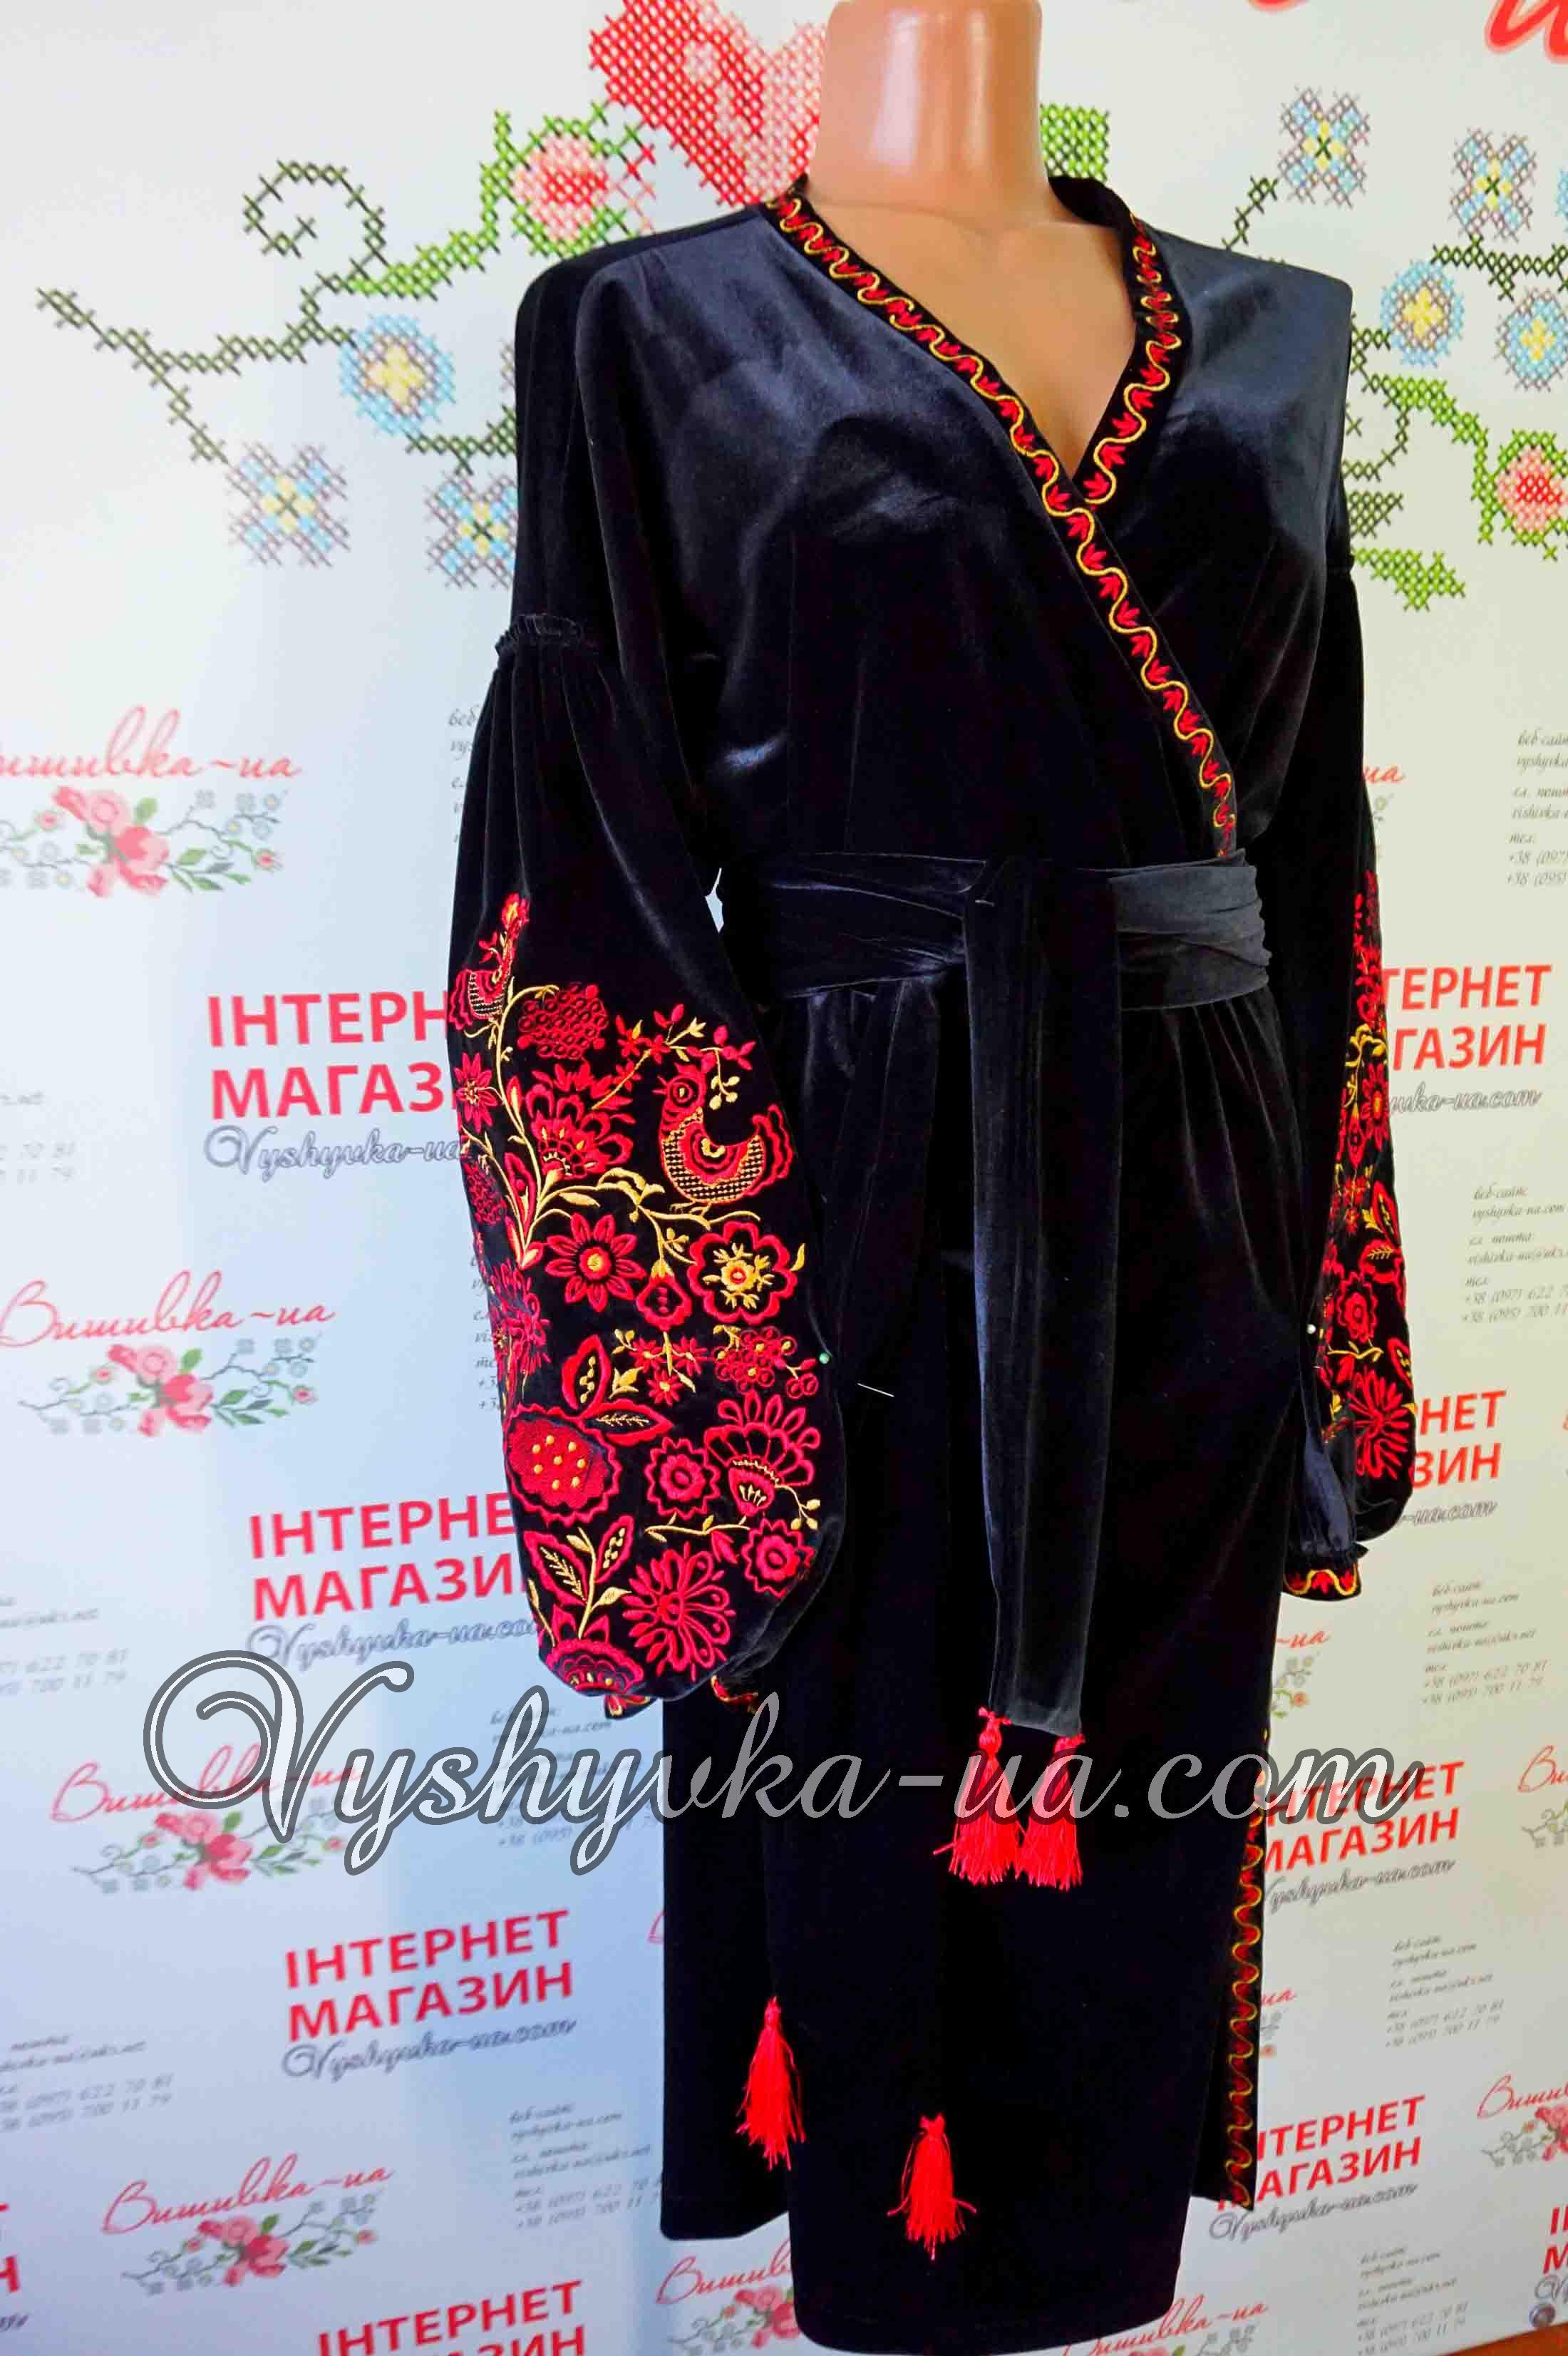 Купити вишиванку Ексклюзивна вишита бархатна сукня в стилі бохо ... 5fcca8474c8d8